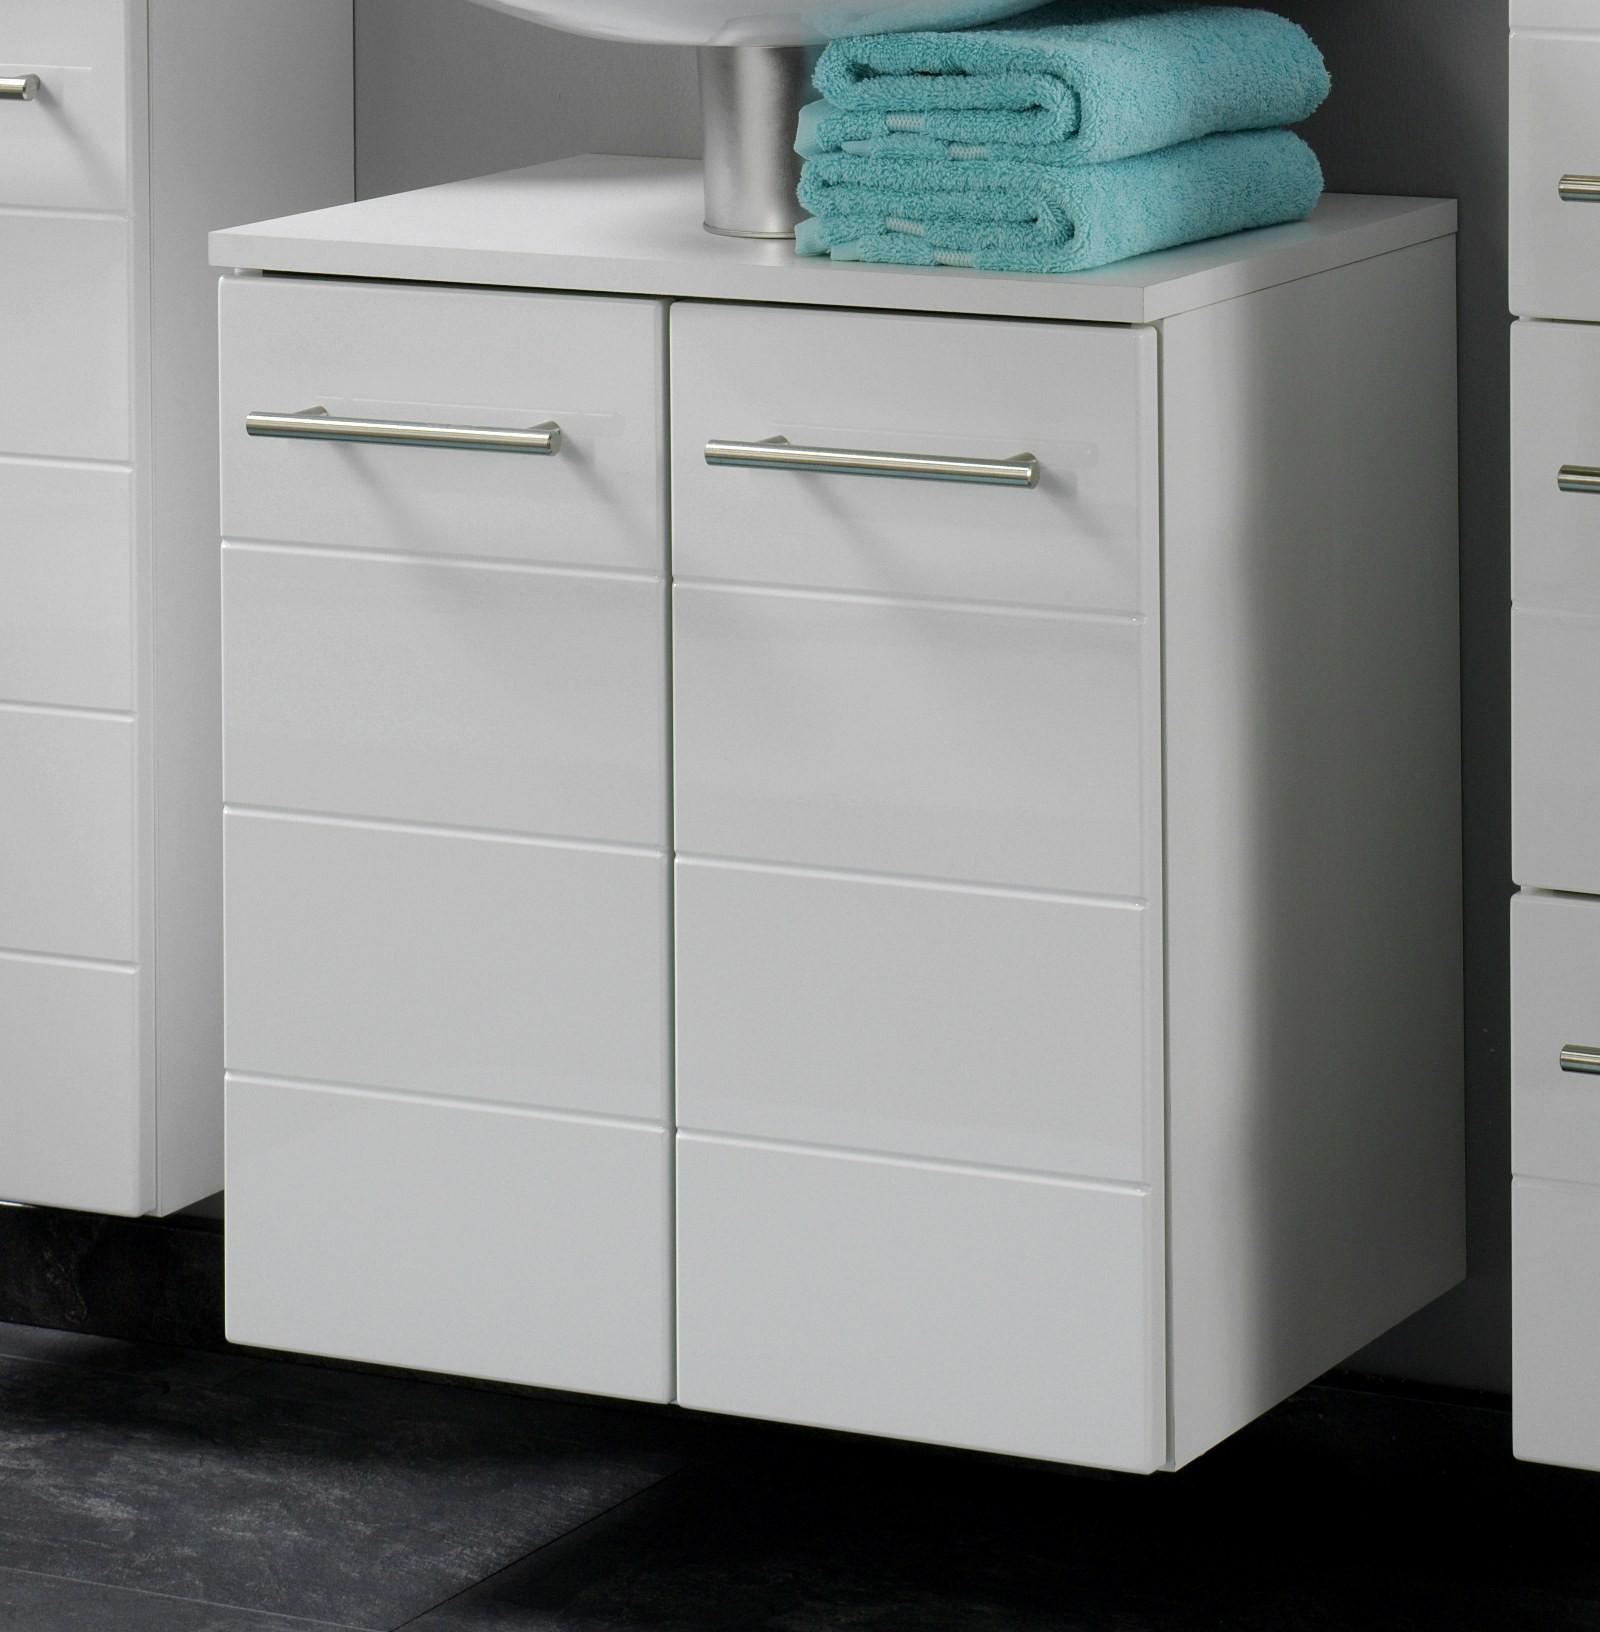 badm bel set rimini 3 teilig 75 cm breit hochglanz wei bad rimini. Black Bedroom Furniture Sets. Home Design Ideas